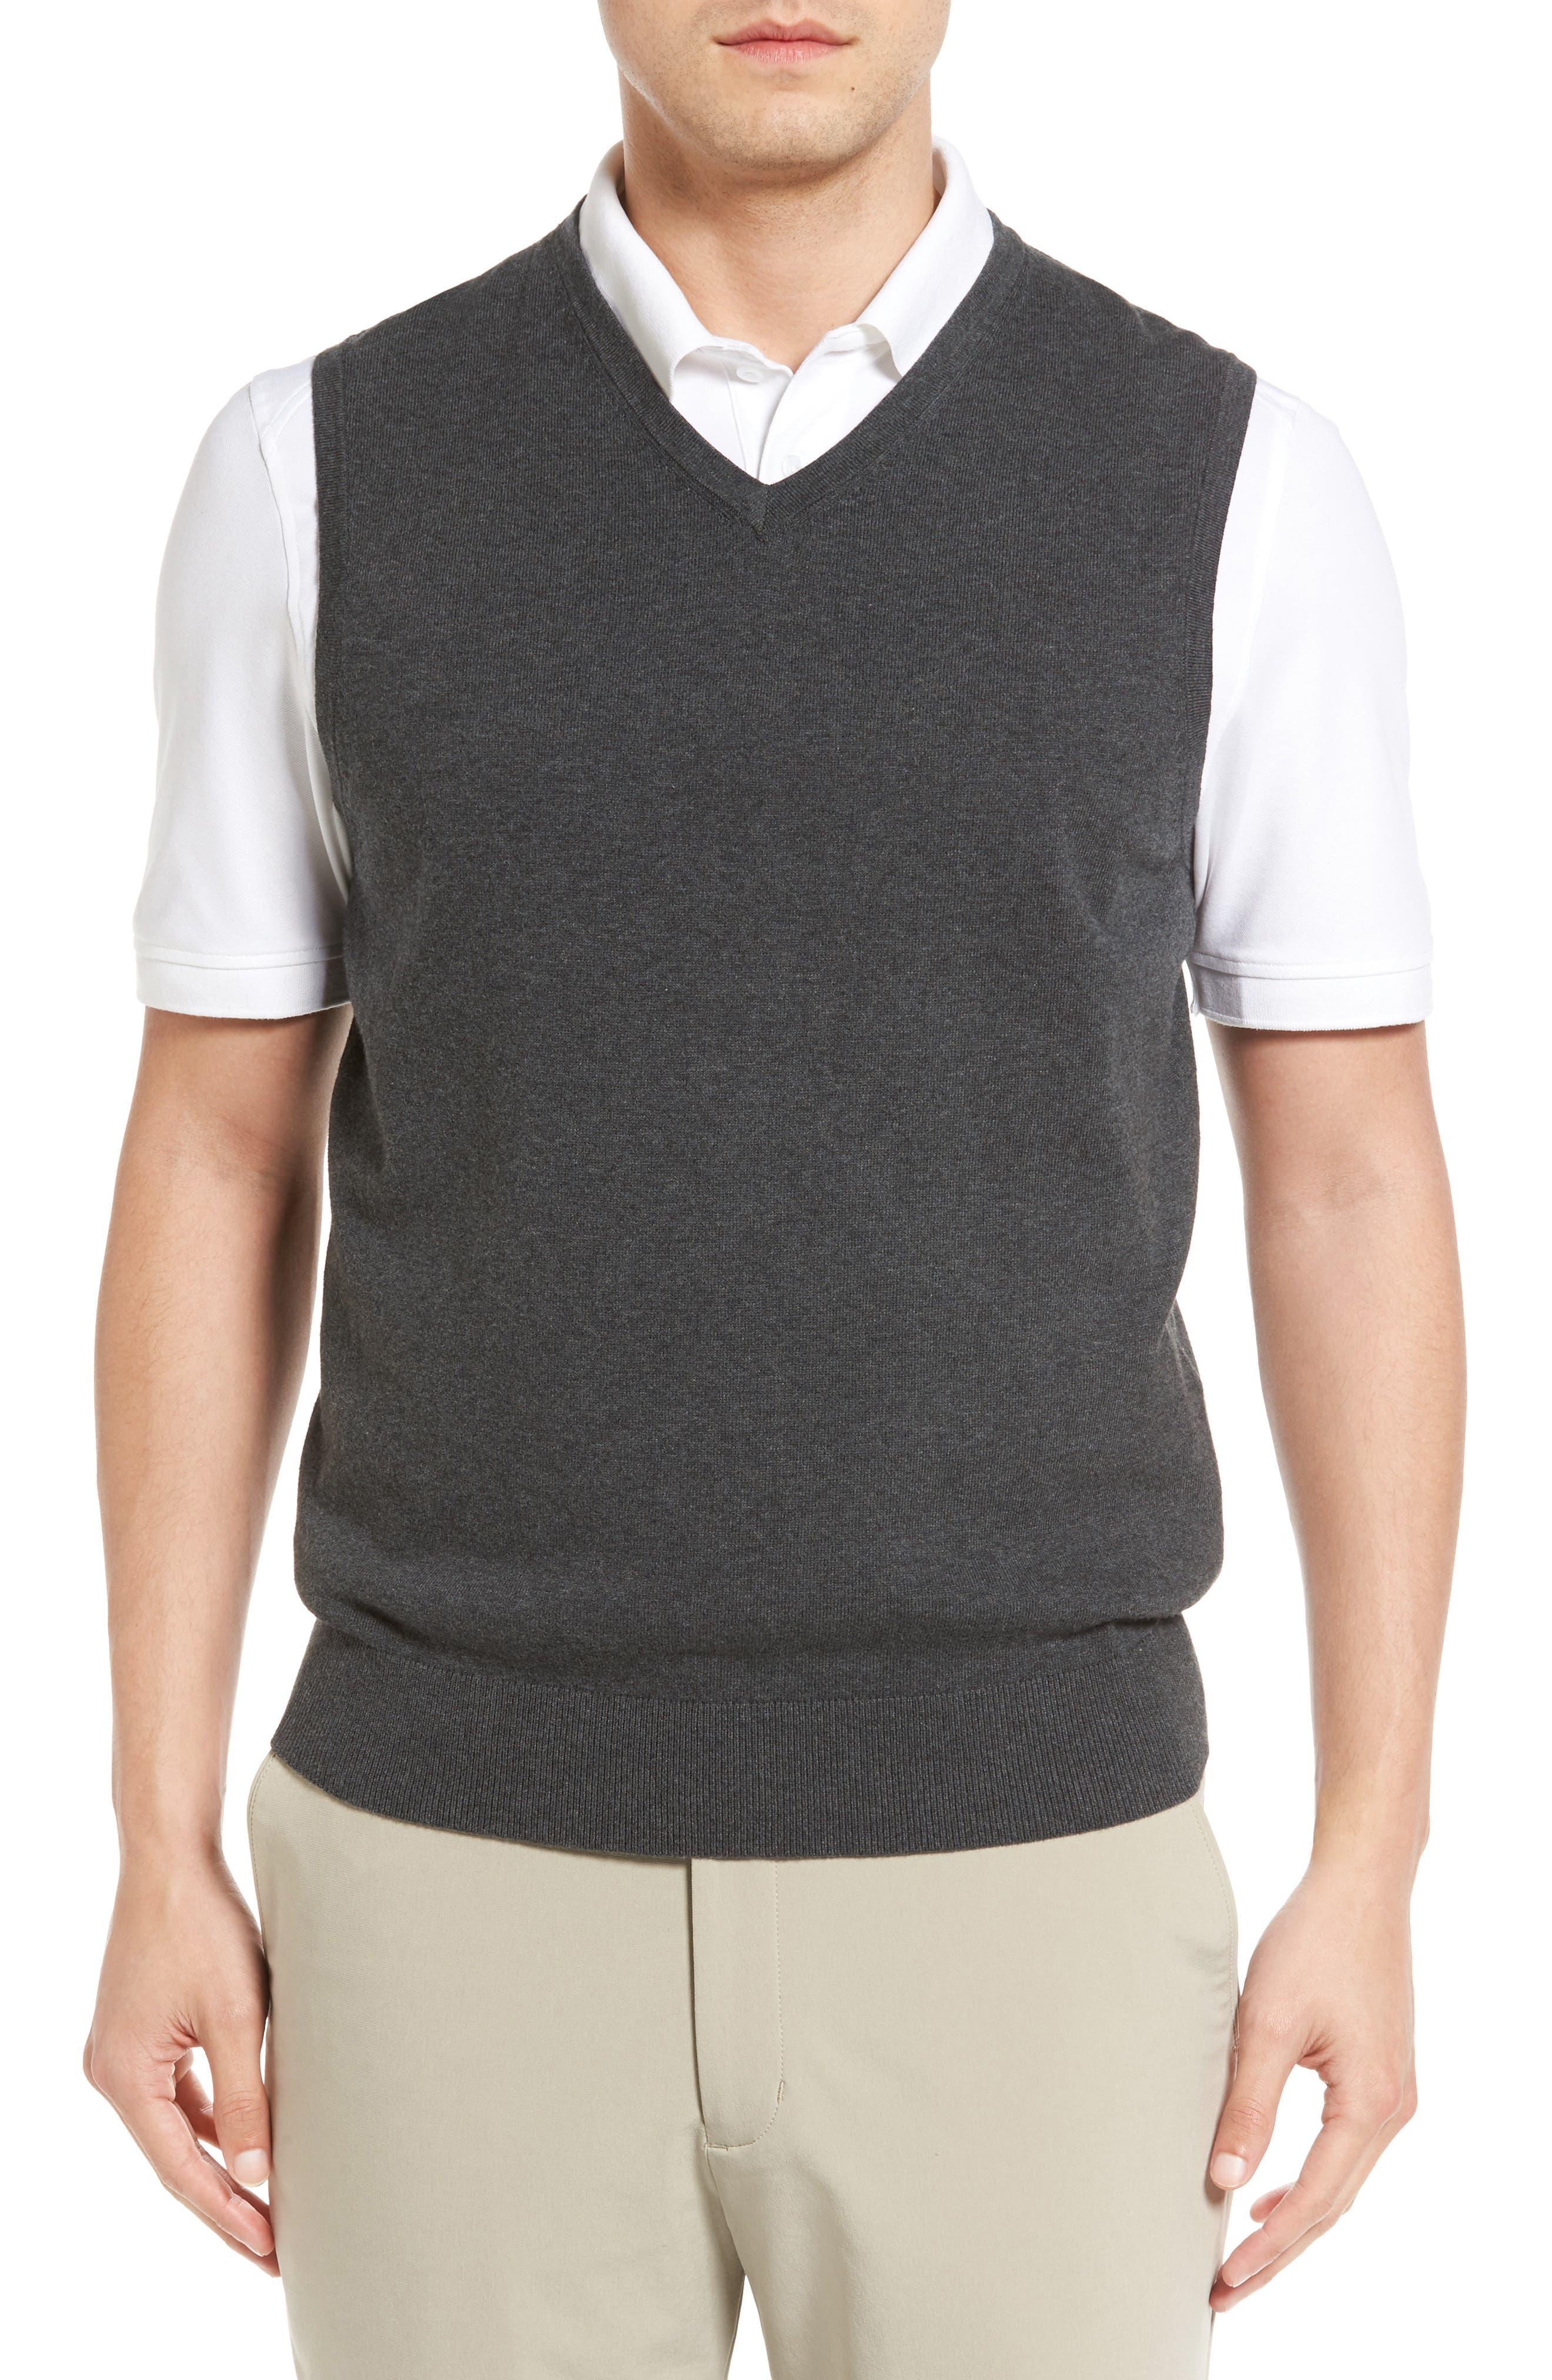 Lakemont V-Neck Sweater Vest,                             Main thumbnail 1, color,                             CHARCOAL HEATHER